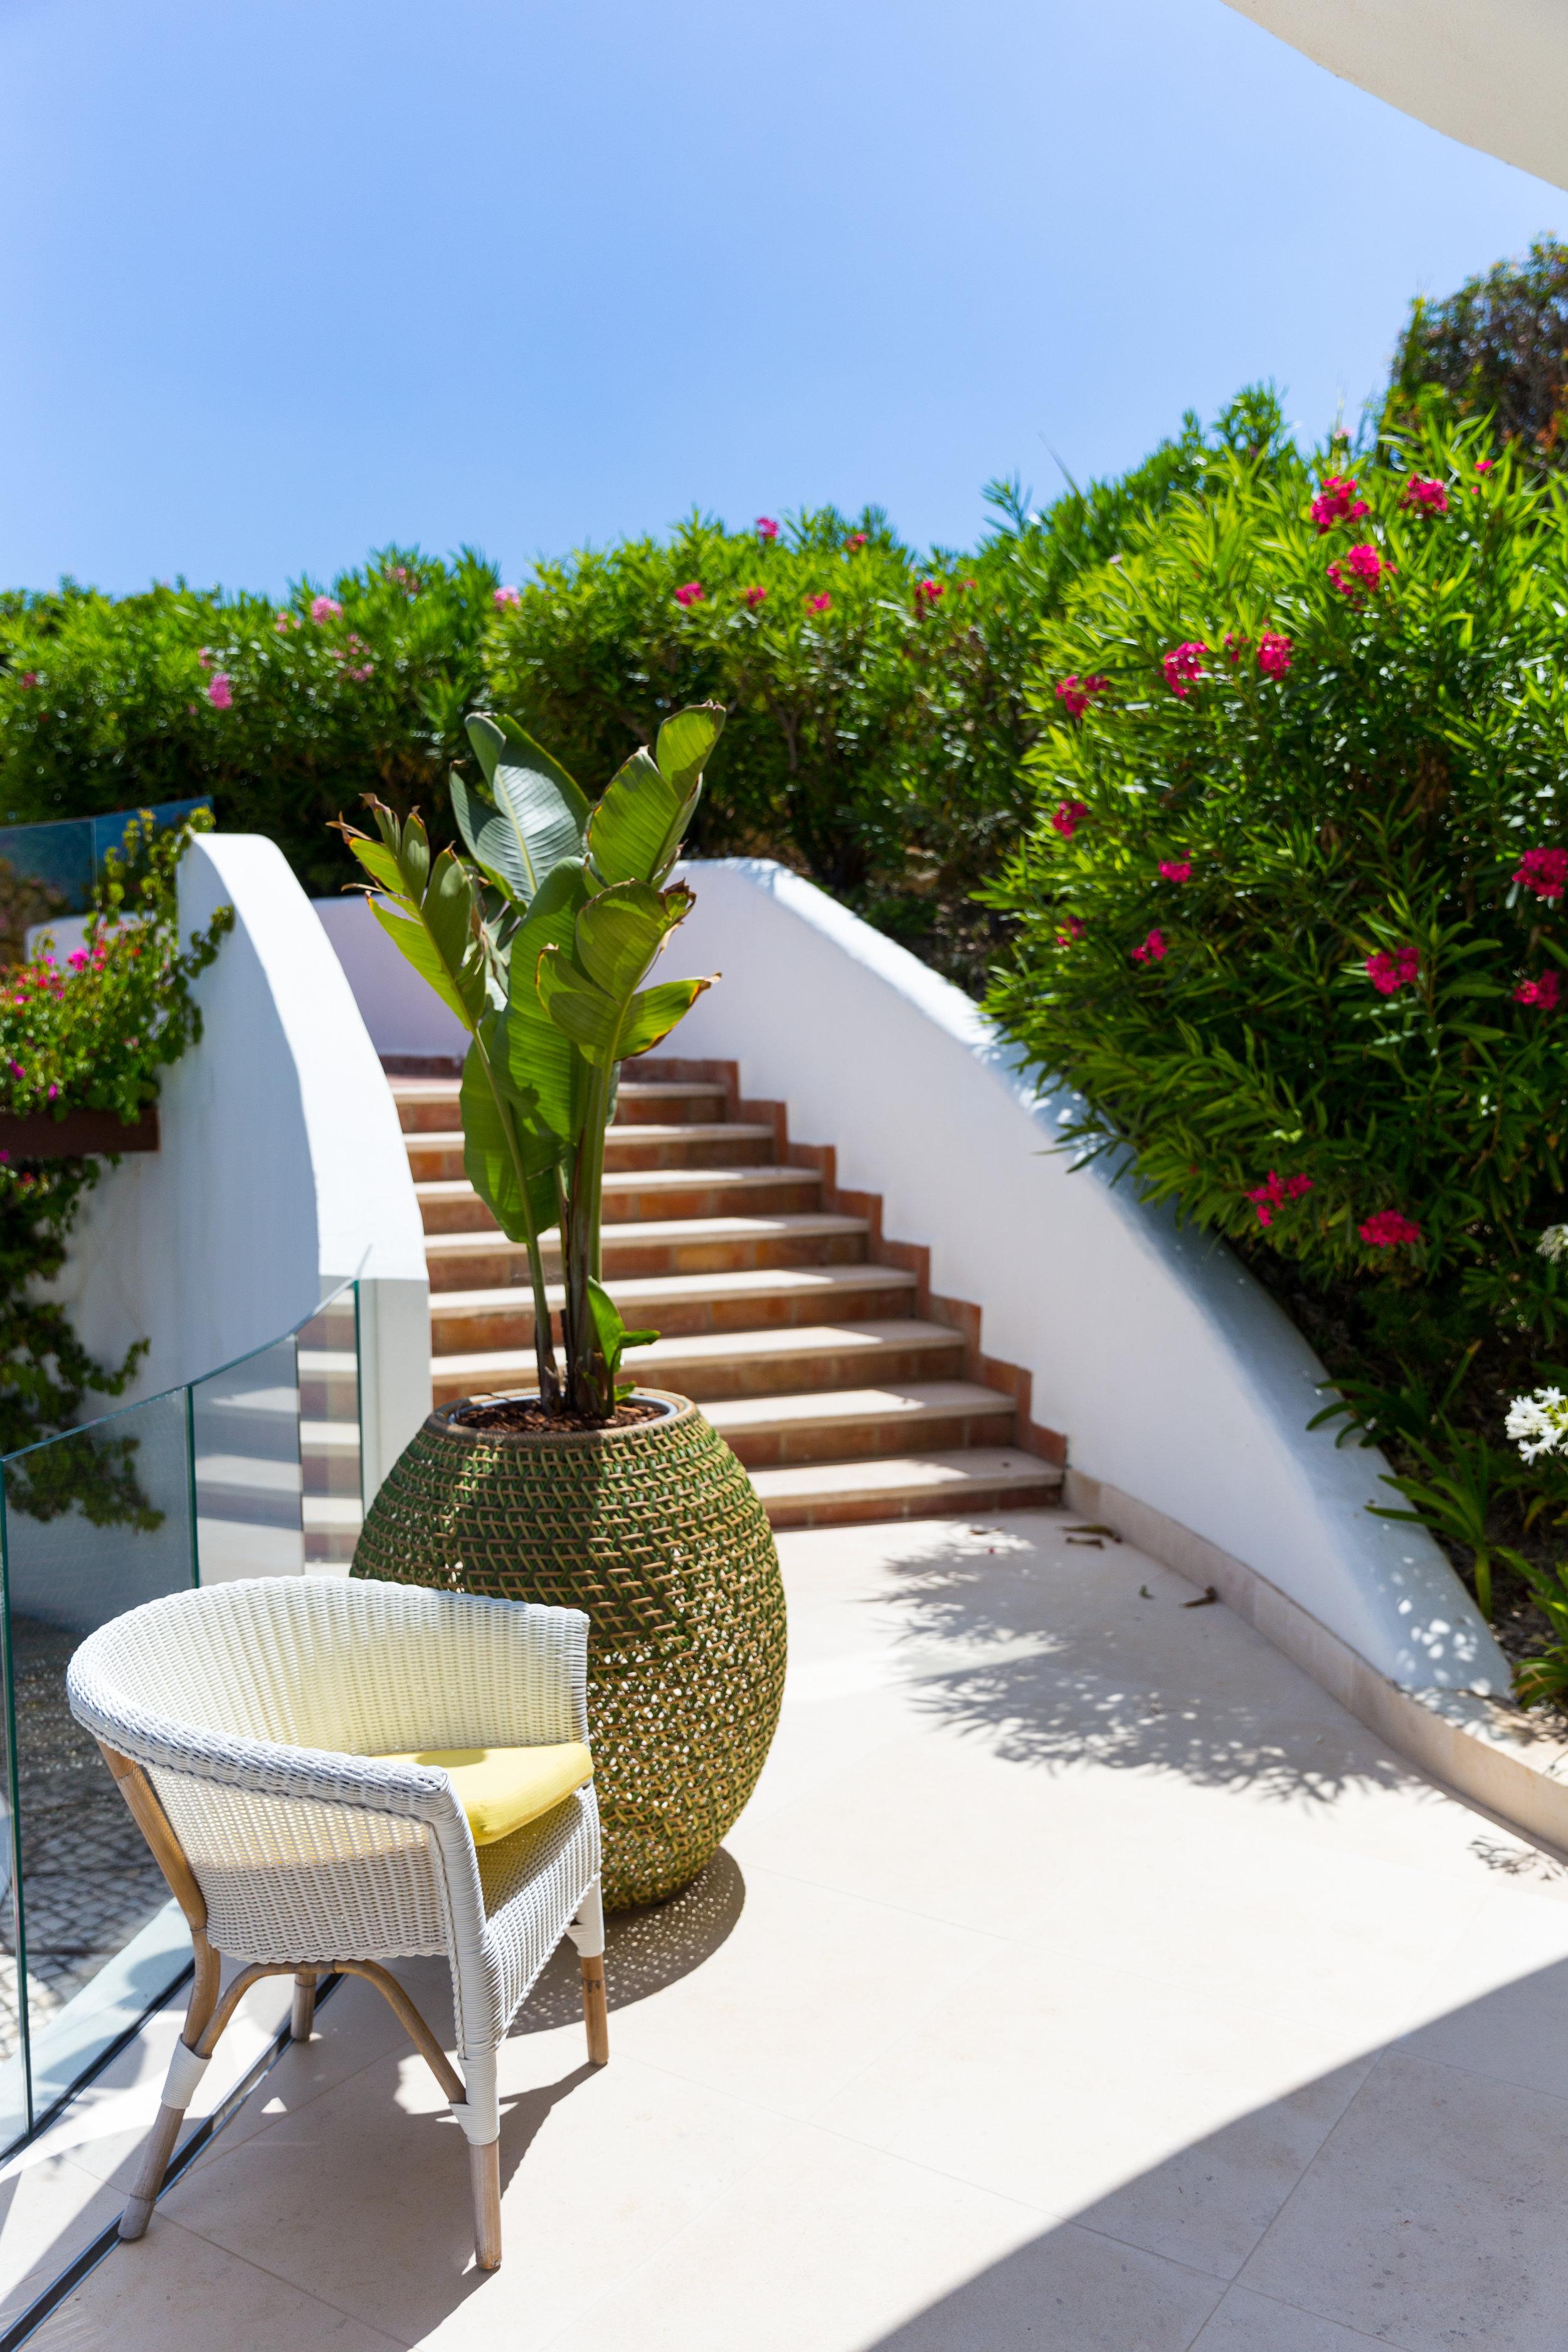 Portugal Algarve Summer Coast-3.jpg